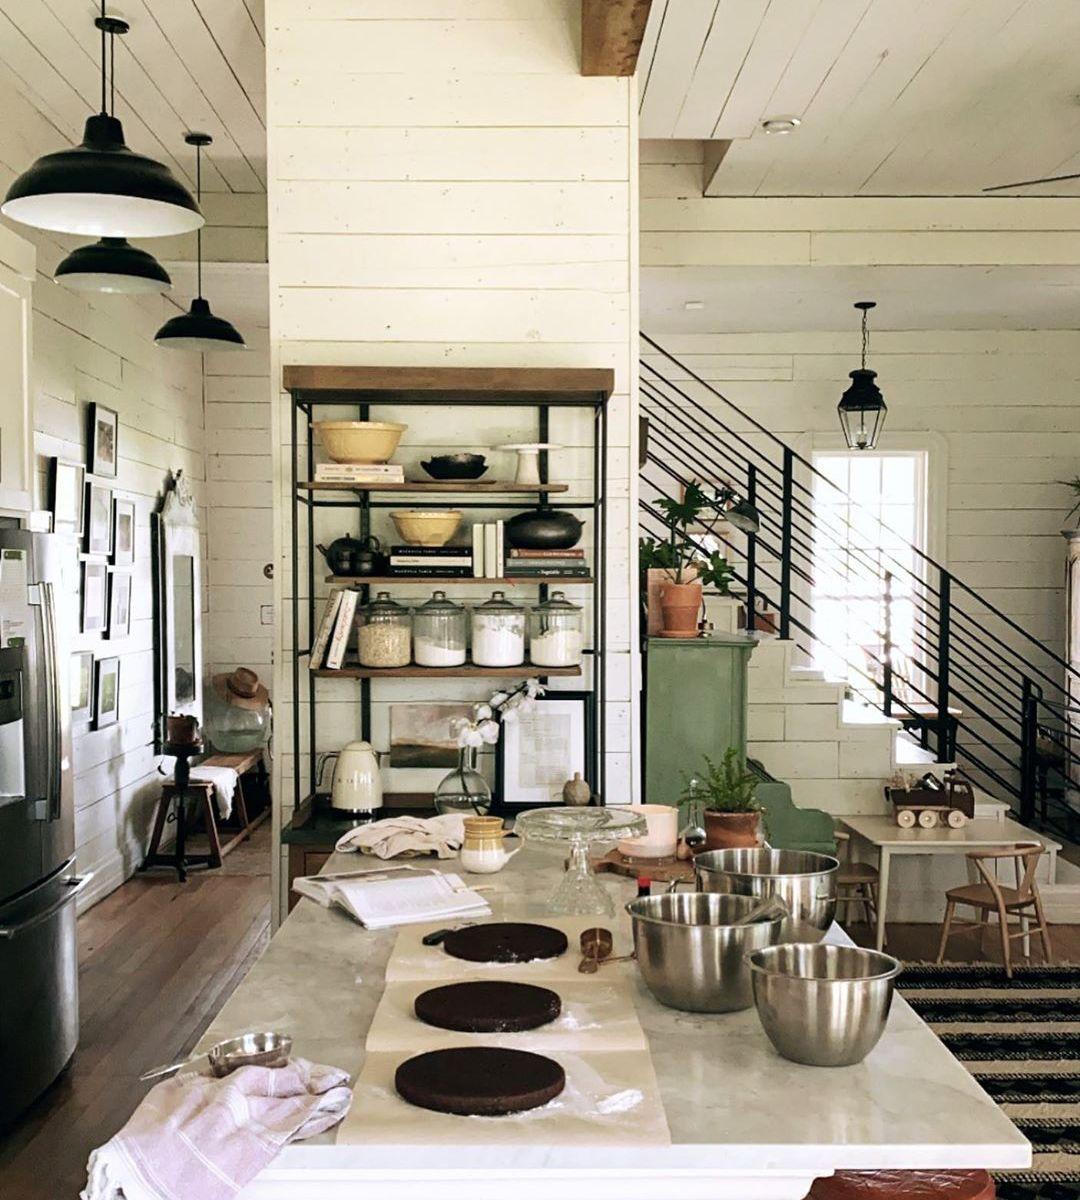 Where Do Chip And Joanna Gaines Live Photos Of Waco Home